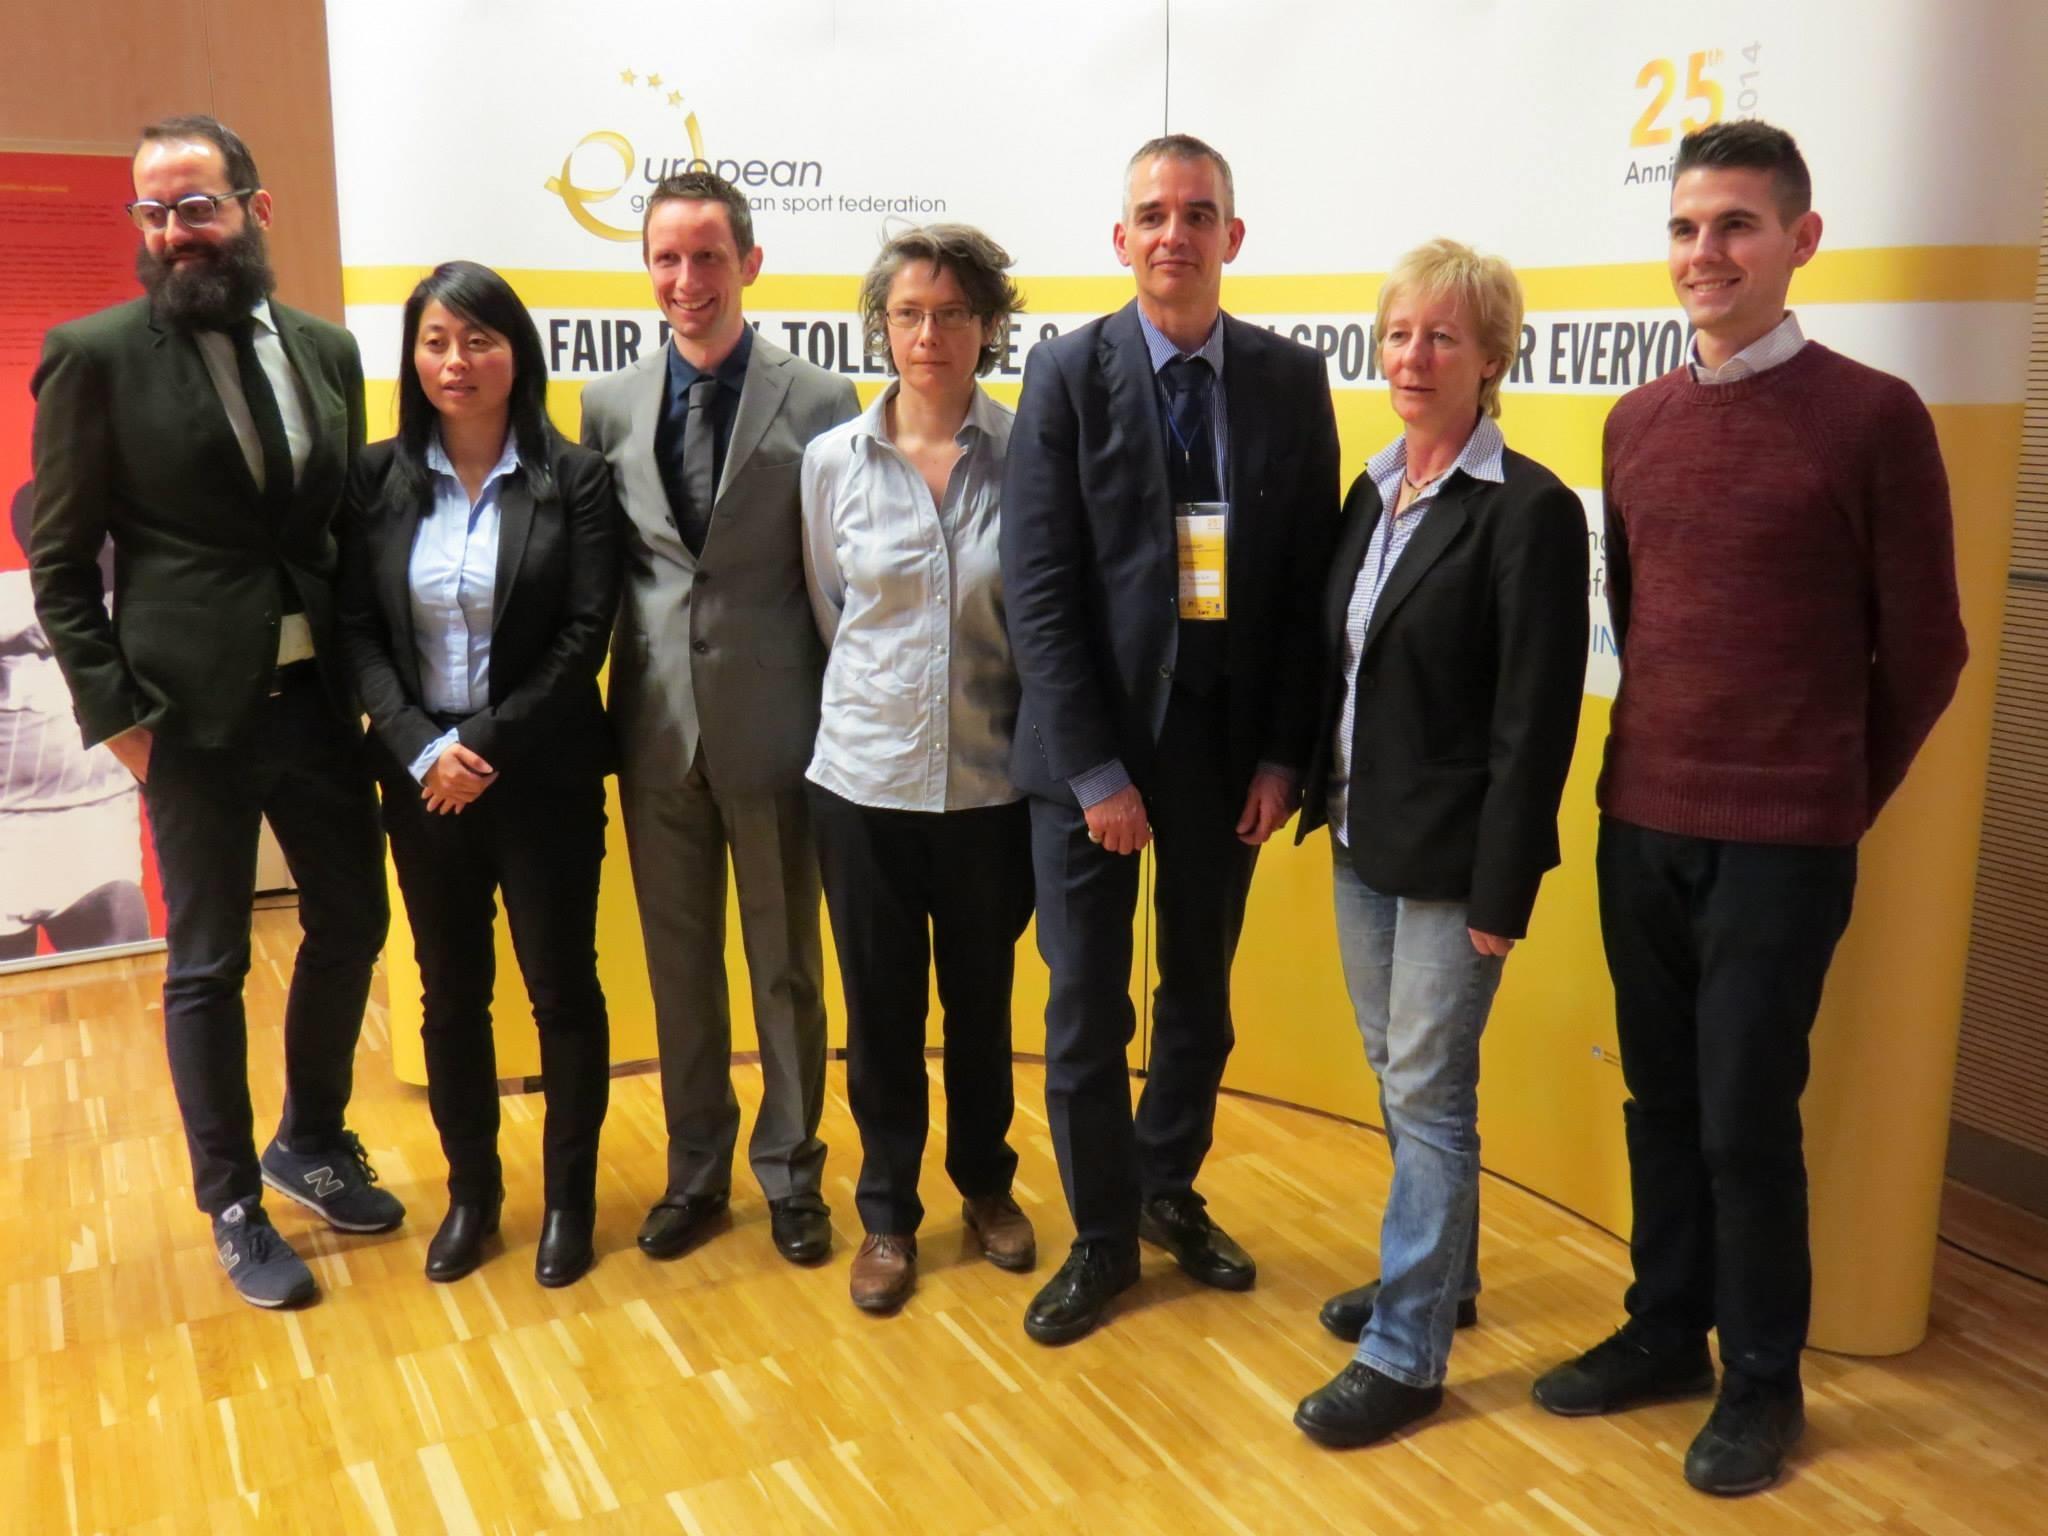 2013-m.-EGLSF-valdyba.-Iš-kairės_-Jon-Landa-Tamara-Tien-Tim-van-Hoydonck-Armelle-Mazé-Klaus-Heusslein-Annette-Wachter-ir-Dániel-Waliduda